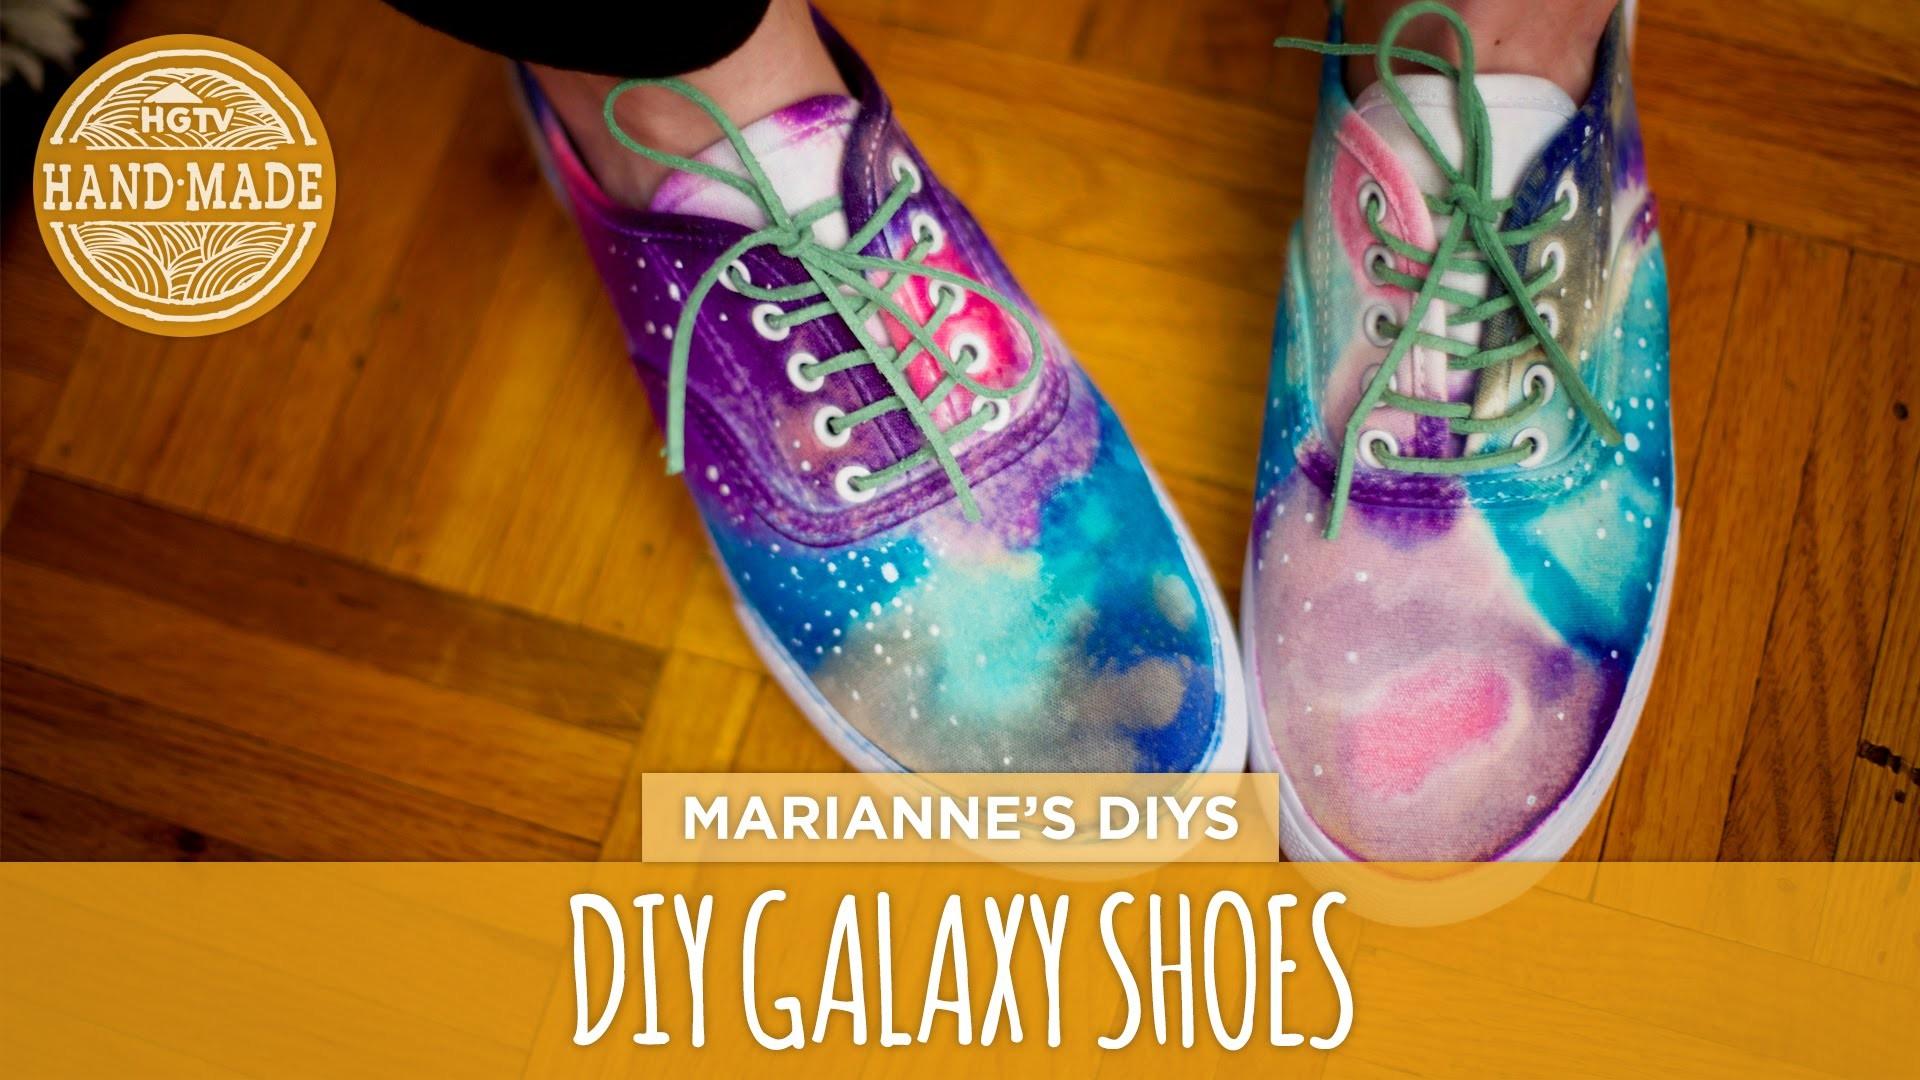 DIY Galaxy-Print Shoes - White Shoes Challenge Week - HGTV Handmade